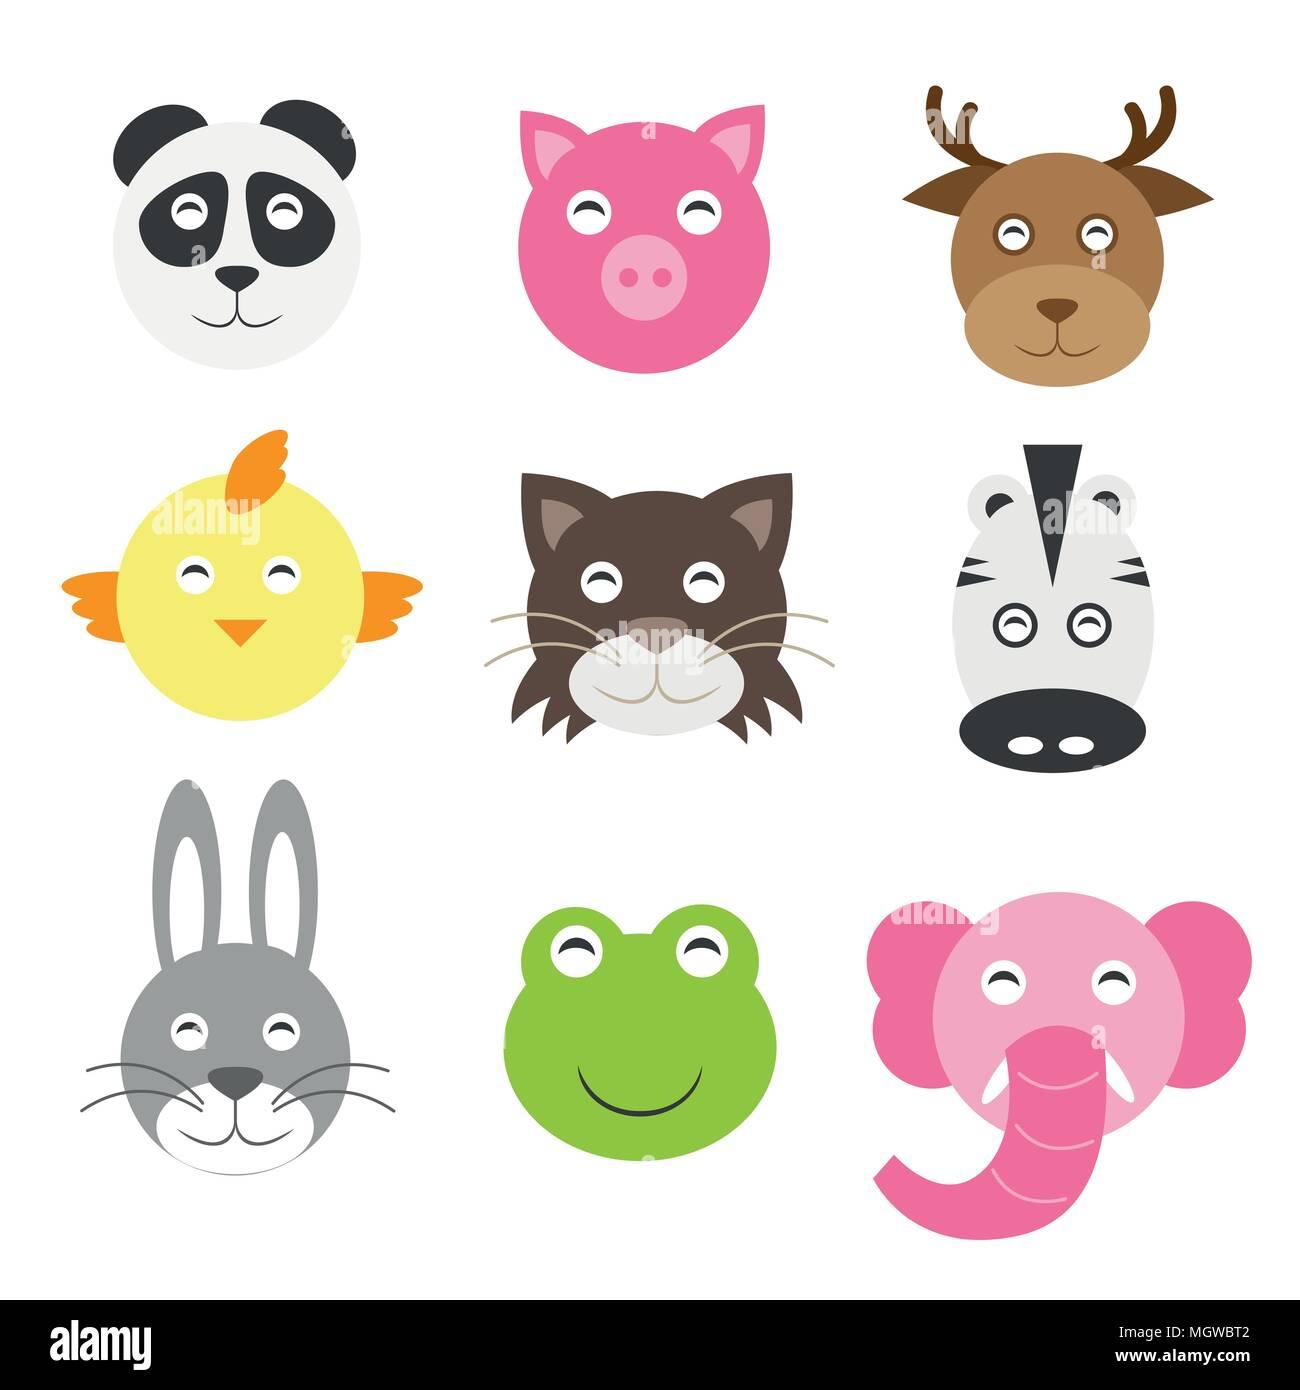 Cute Cartoon Animals Head Round Shape In Flat Style Stock Vector Art